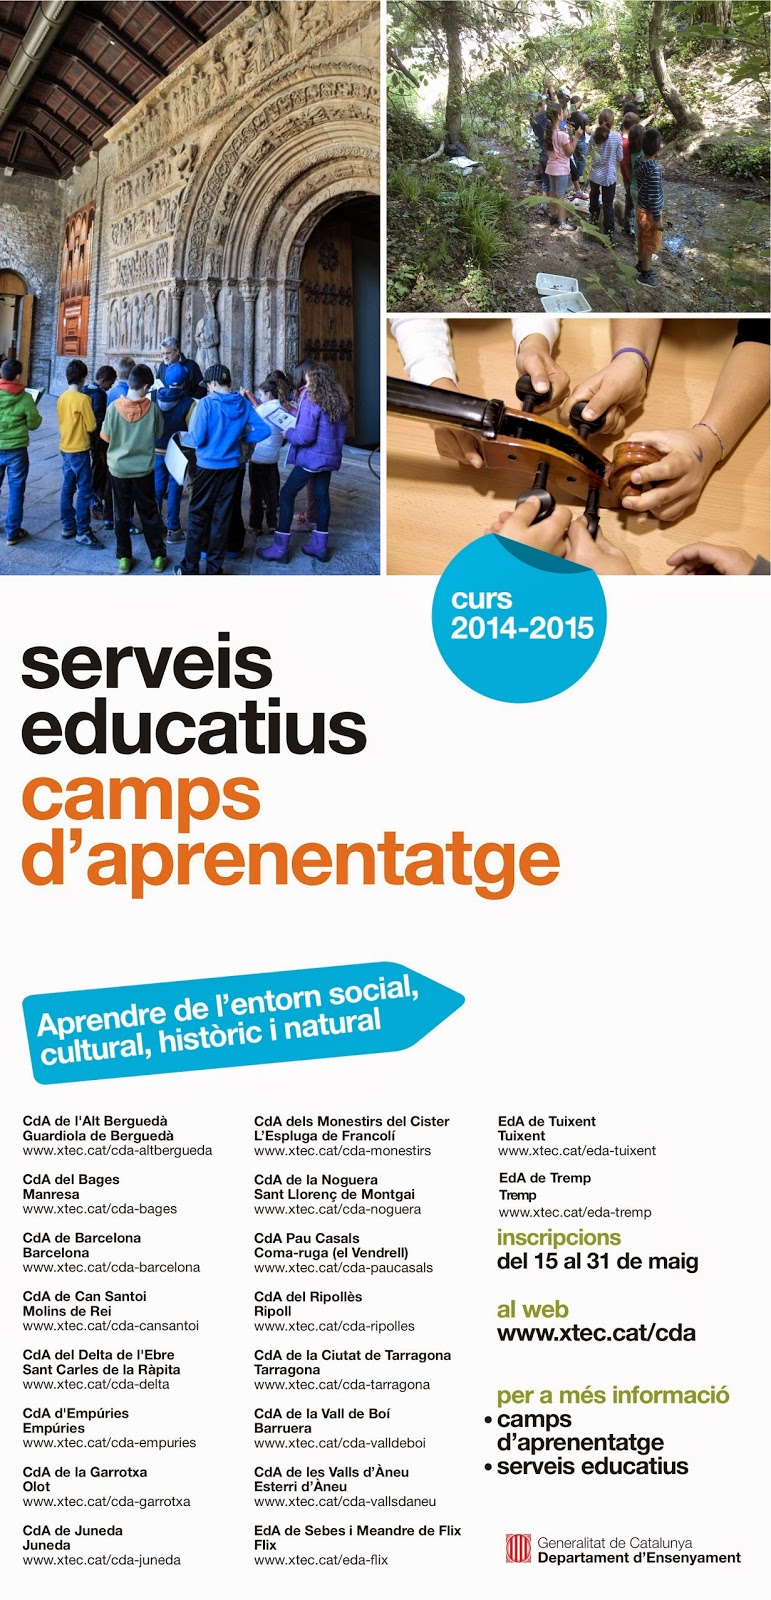 http://www.xtec.cat/web/serveis/serveis/cda/inscripcio